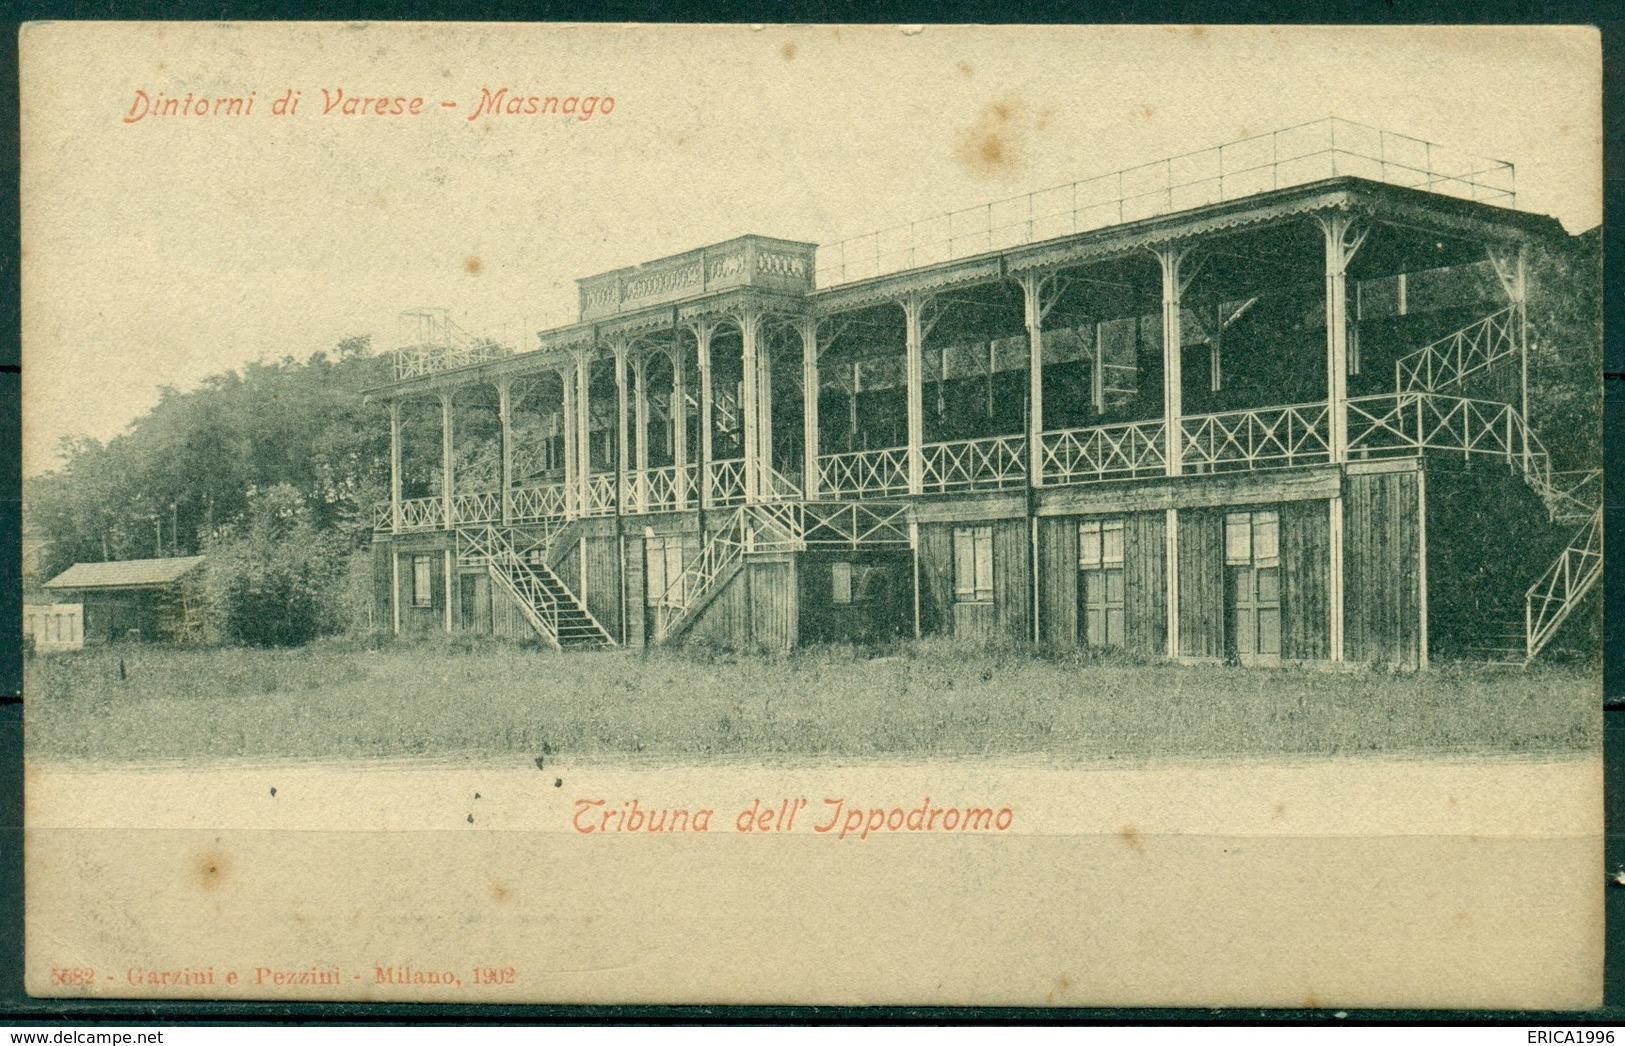 CARTOLINA - VARESE - CV534 MASNAGO (Varese VA) Tribuna Dell'Ippodromo, FP, Viaggiata 1912, Buone Condizioni - Varese